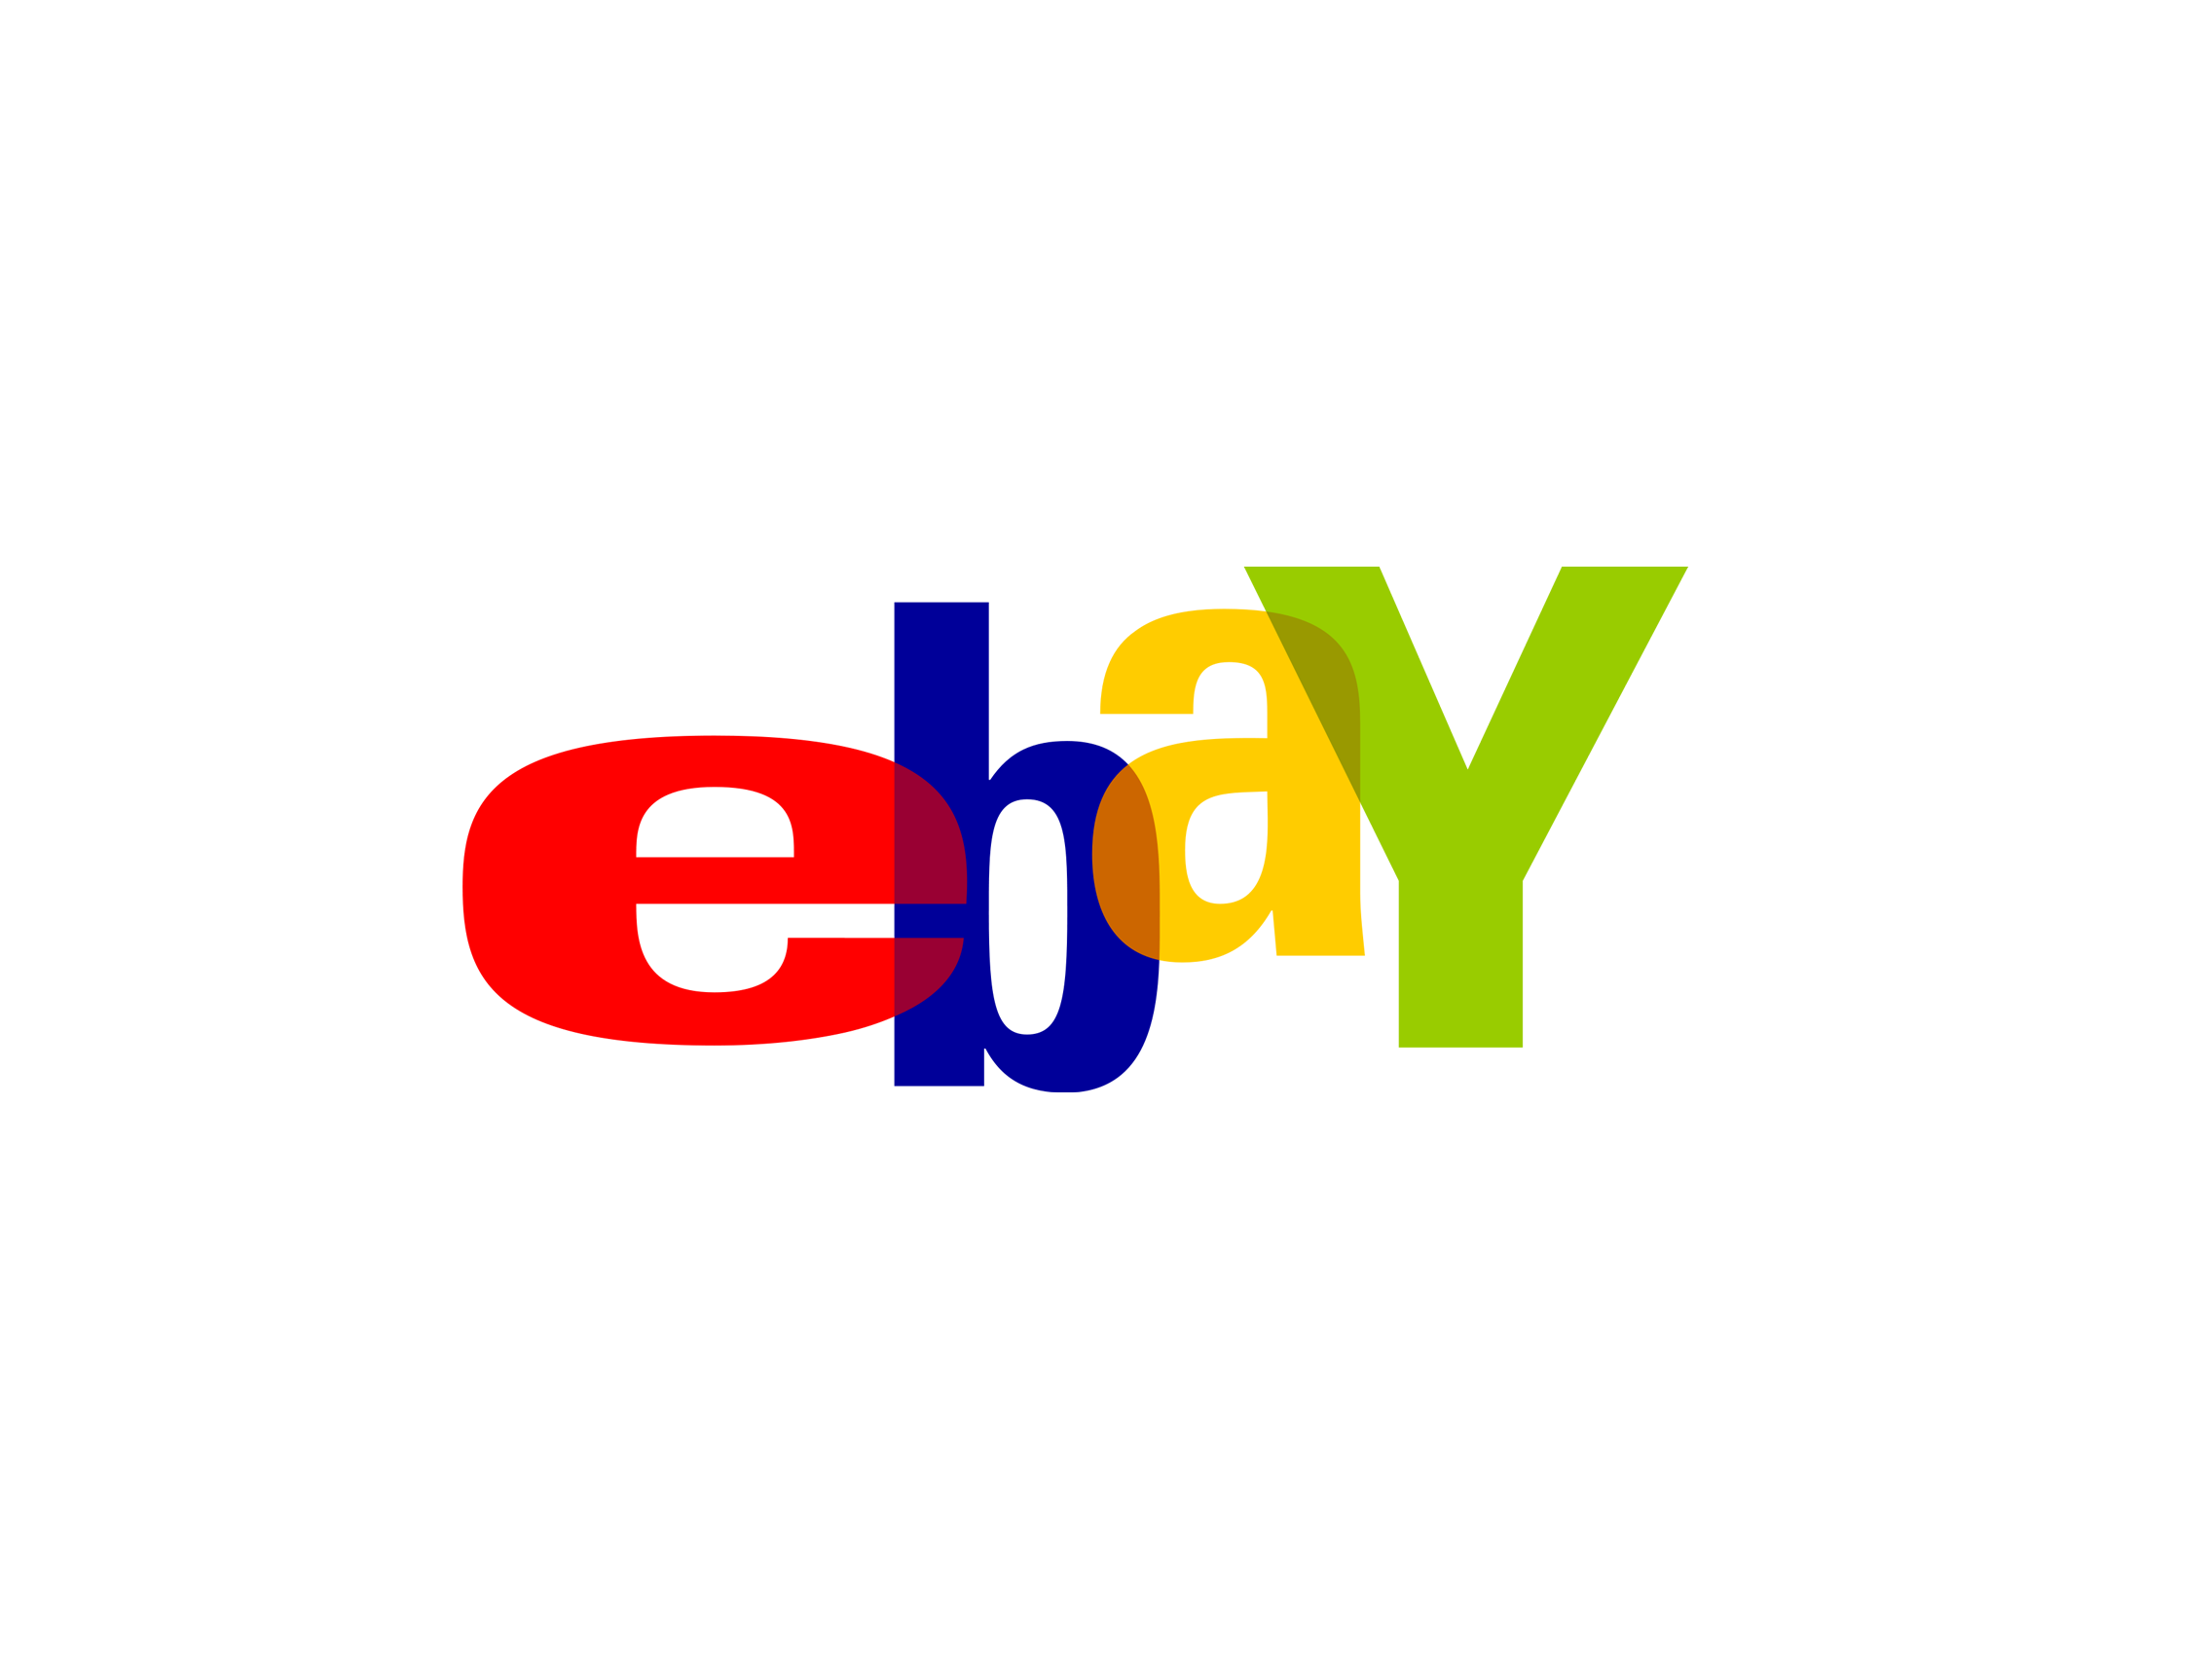 Ebay logo PNG.